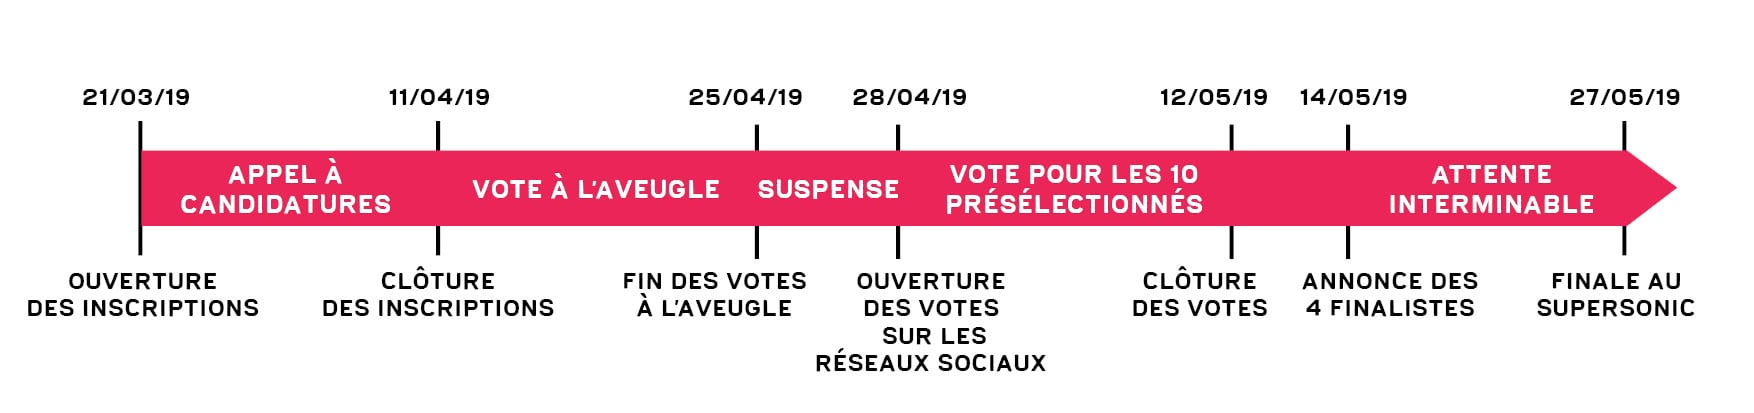 https://cdn2.szigetfestival.com/cgutcp/f851/fr/media/2019/03/frise_tremplin_rouge_27_mai.jpg